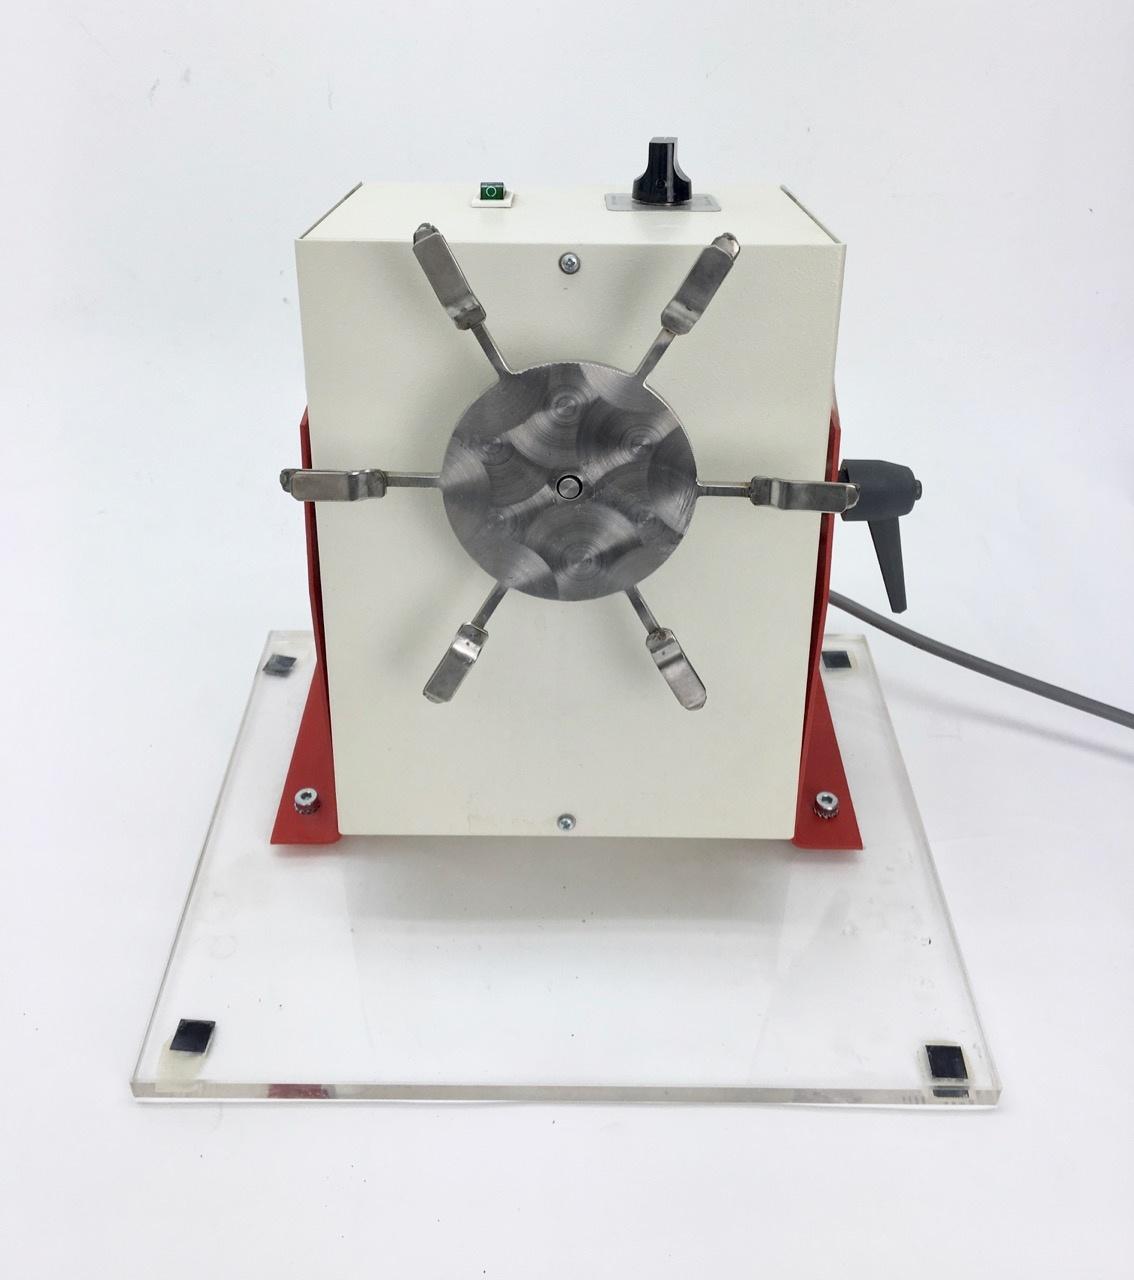 LTF Fröbel Labortechnik GmbH CMV-ROM Drehrad